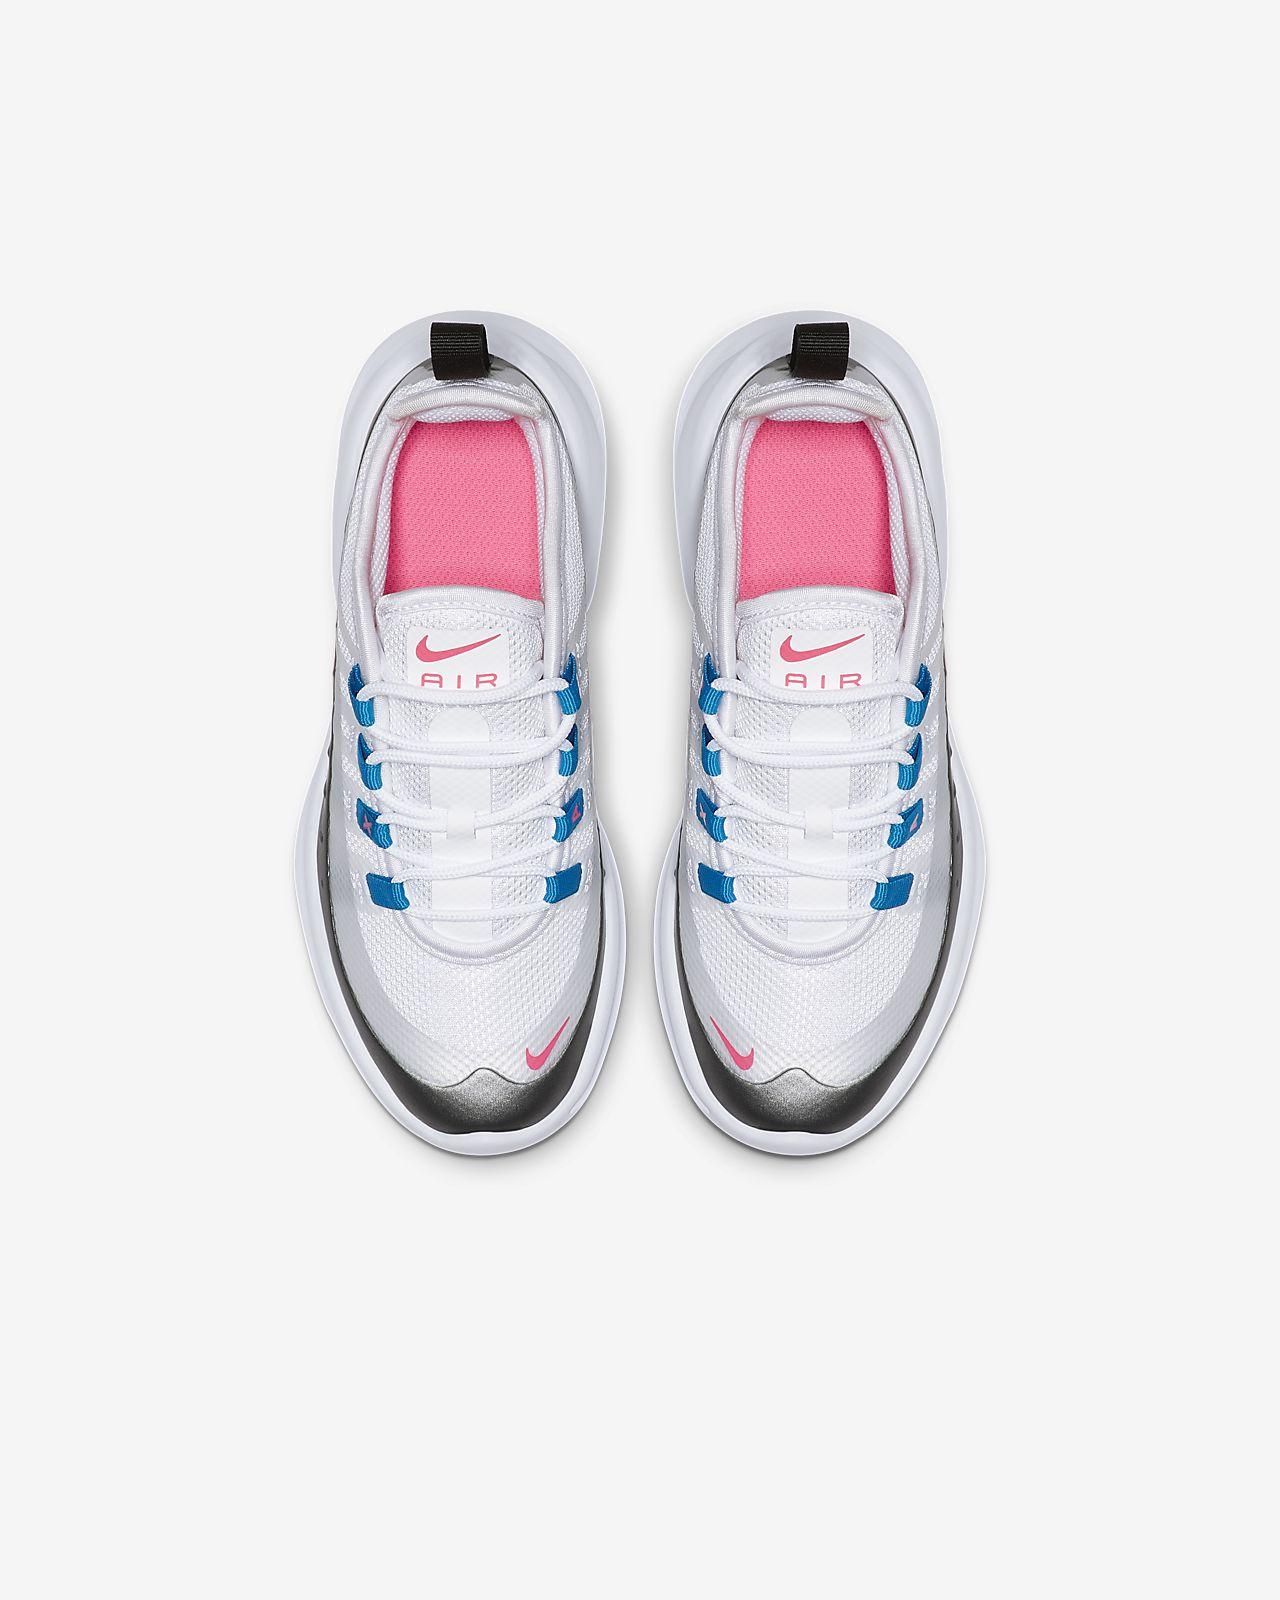 Nike Air Max Axis Schoen voor baby'speuters. Nike NL